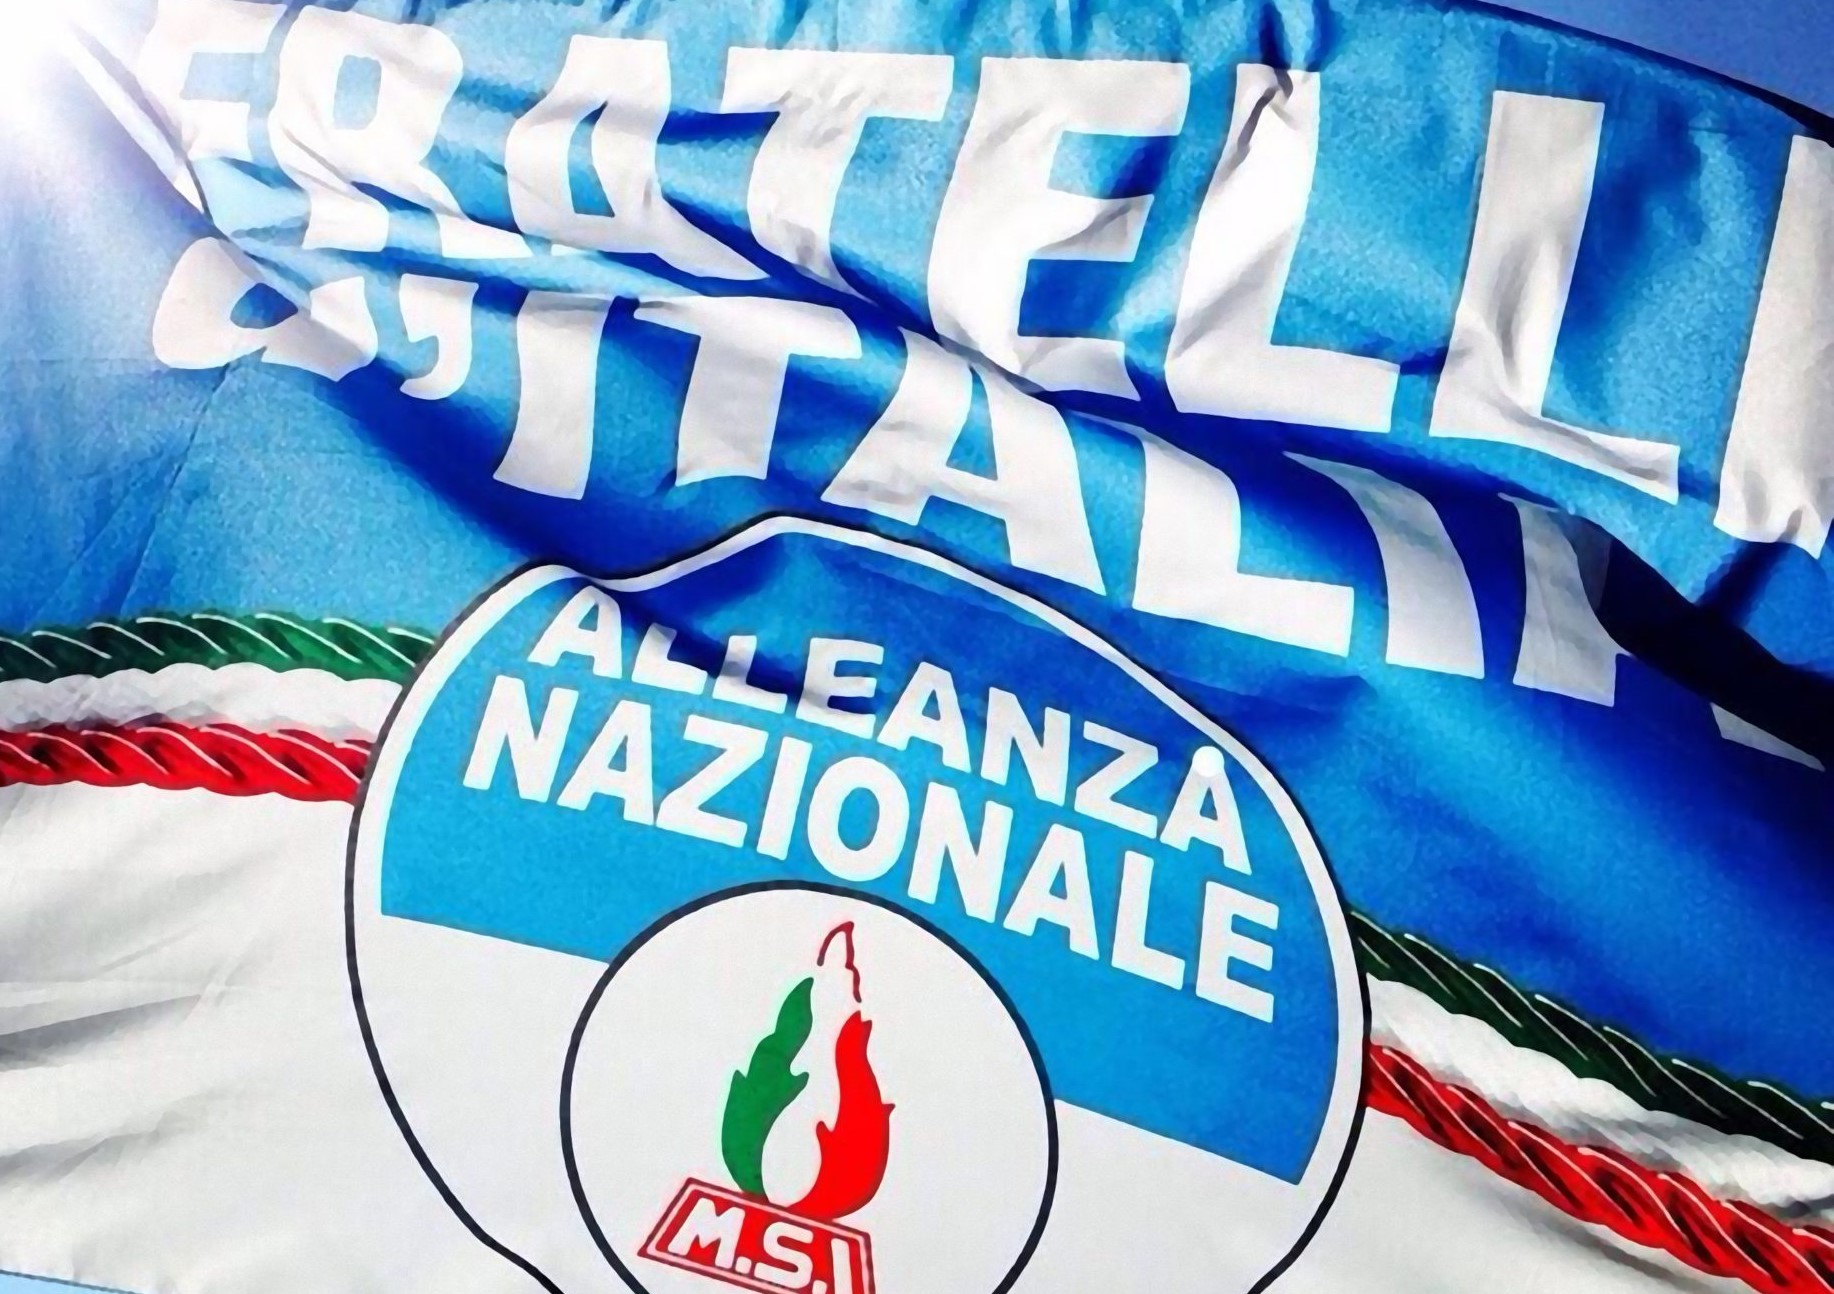 Giorgia Meloni sorpassa forza italia